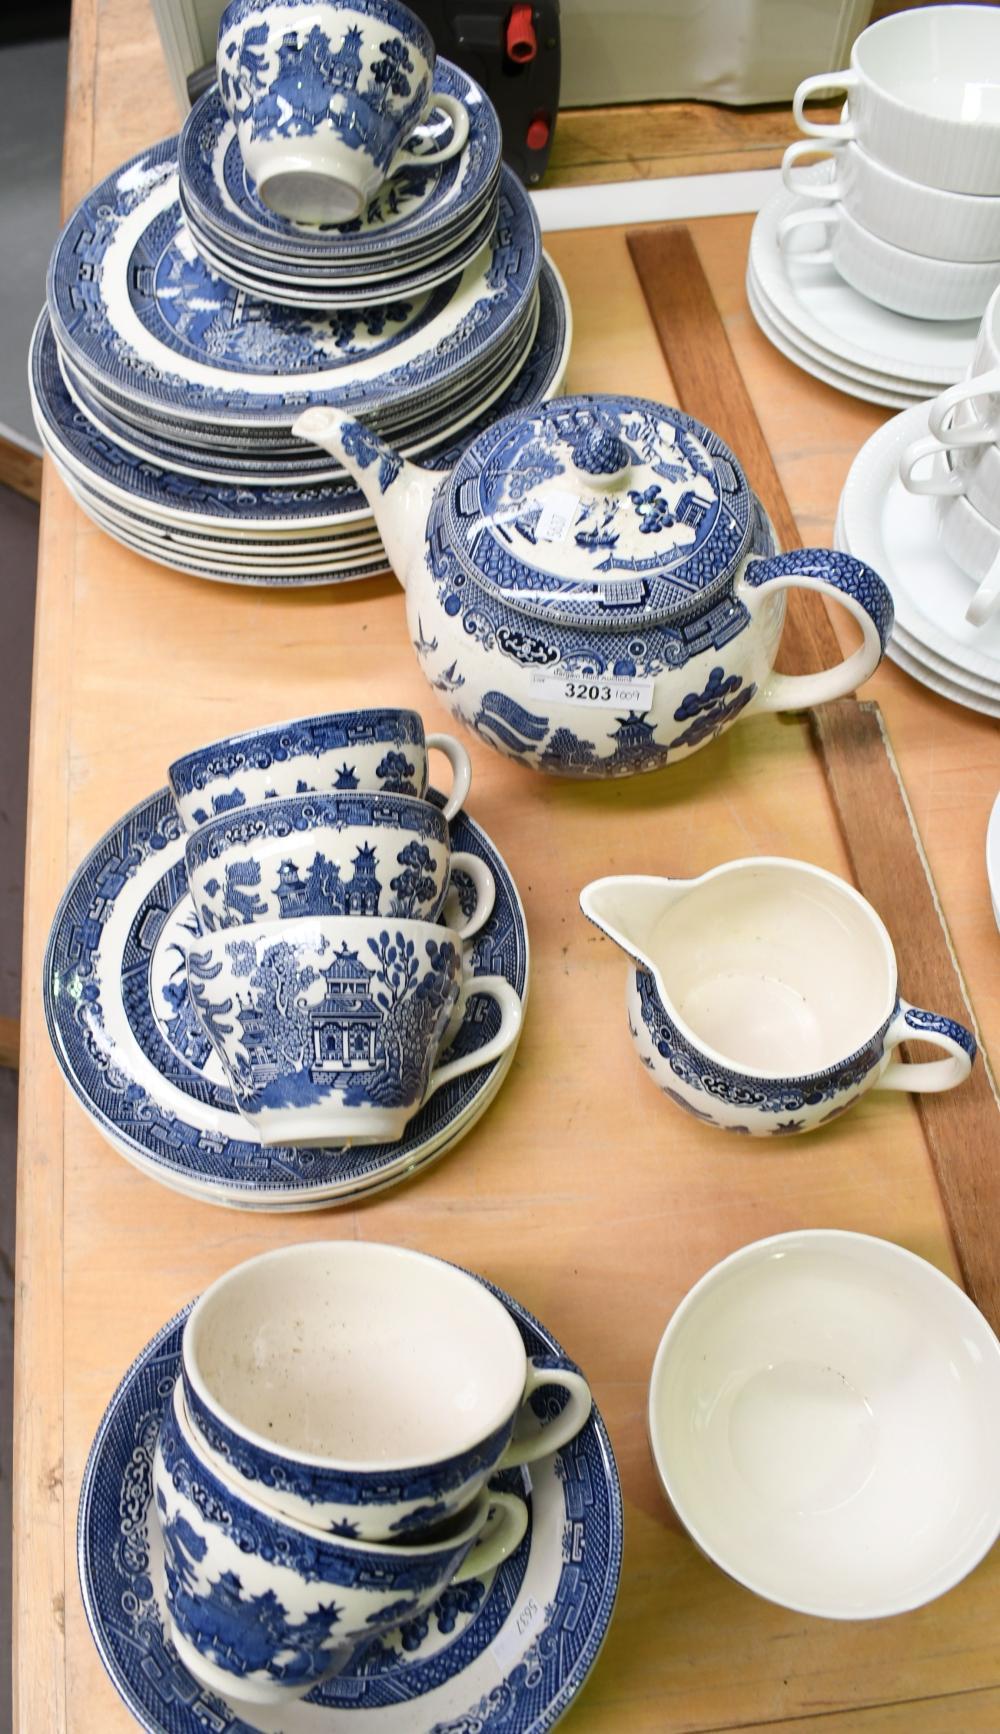 English blue willow dinnerware by Johnson Bros.